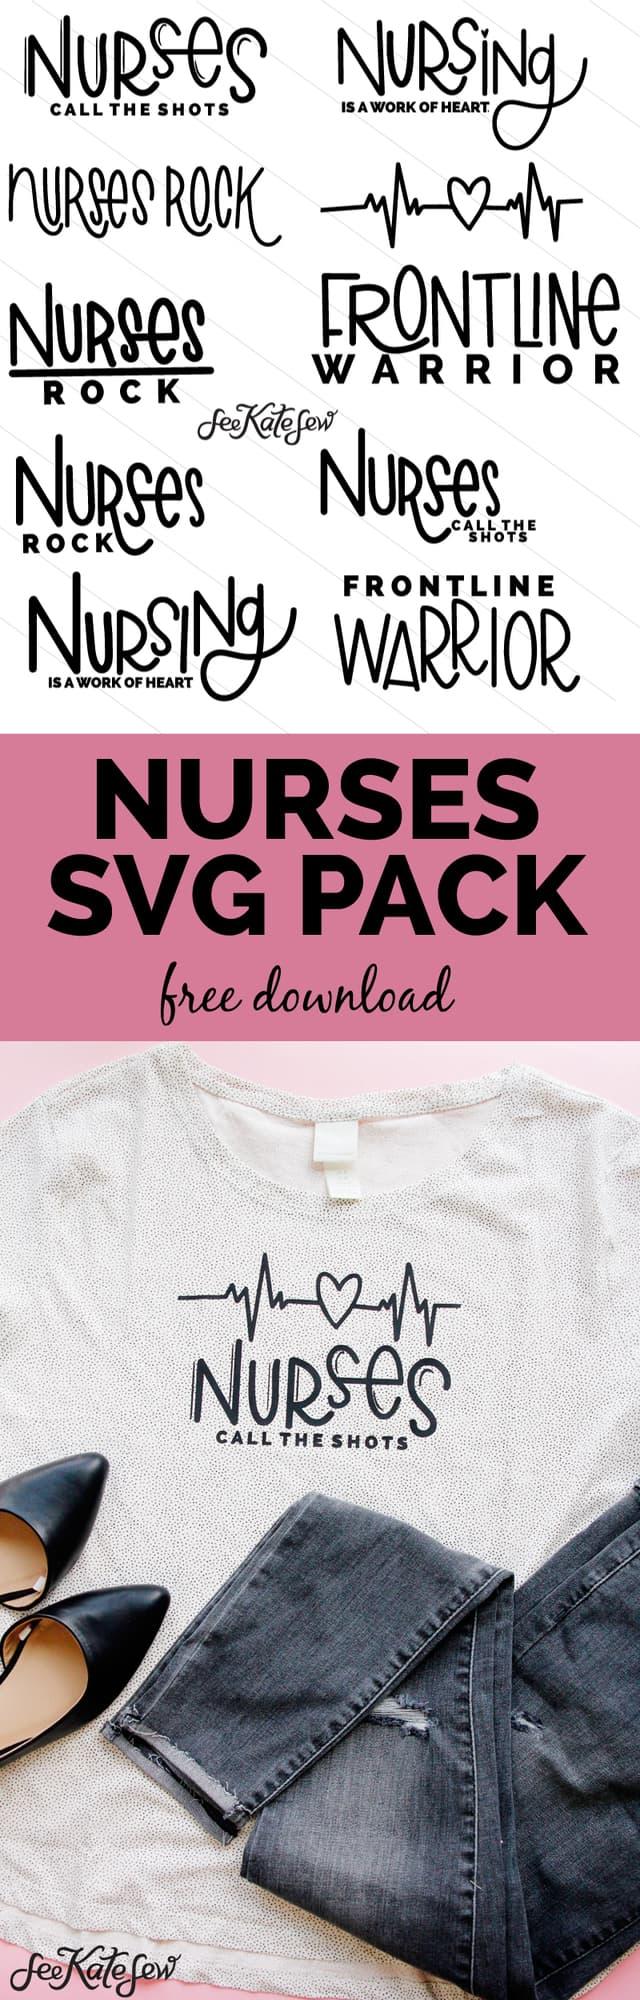 Nurses SVG Design Pack | National Nurses Week